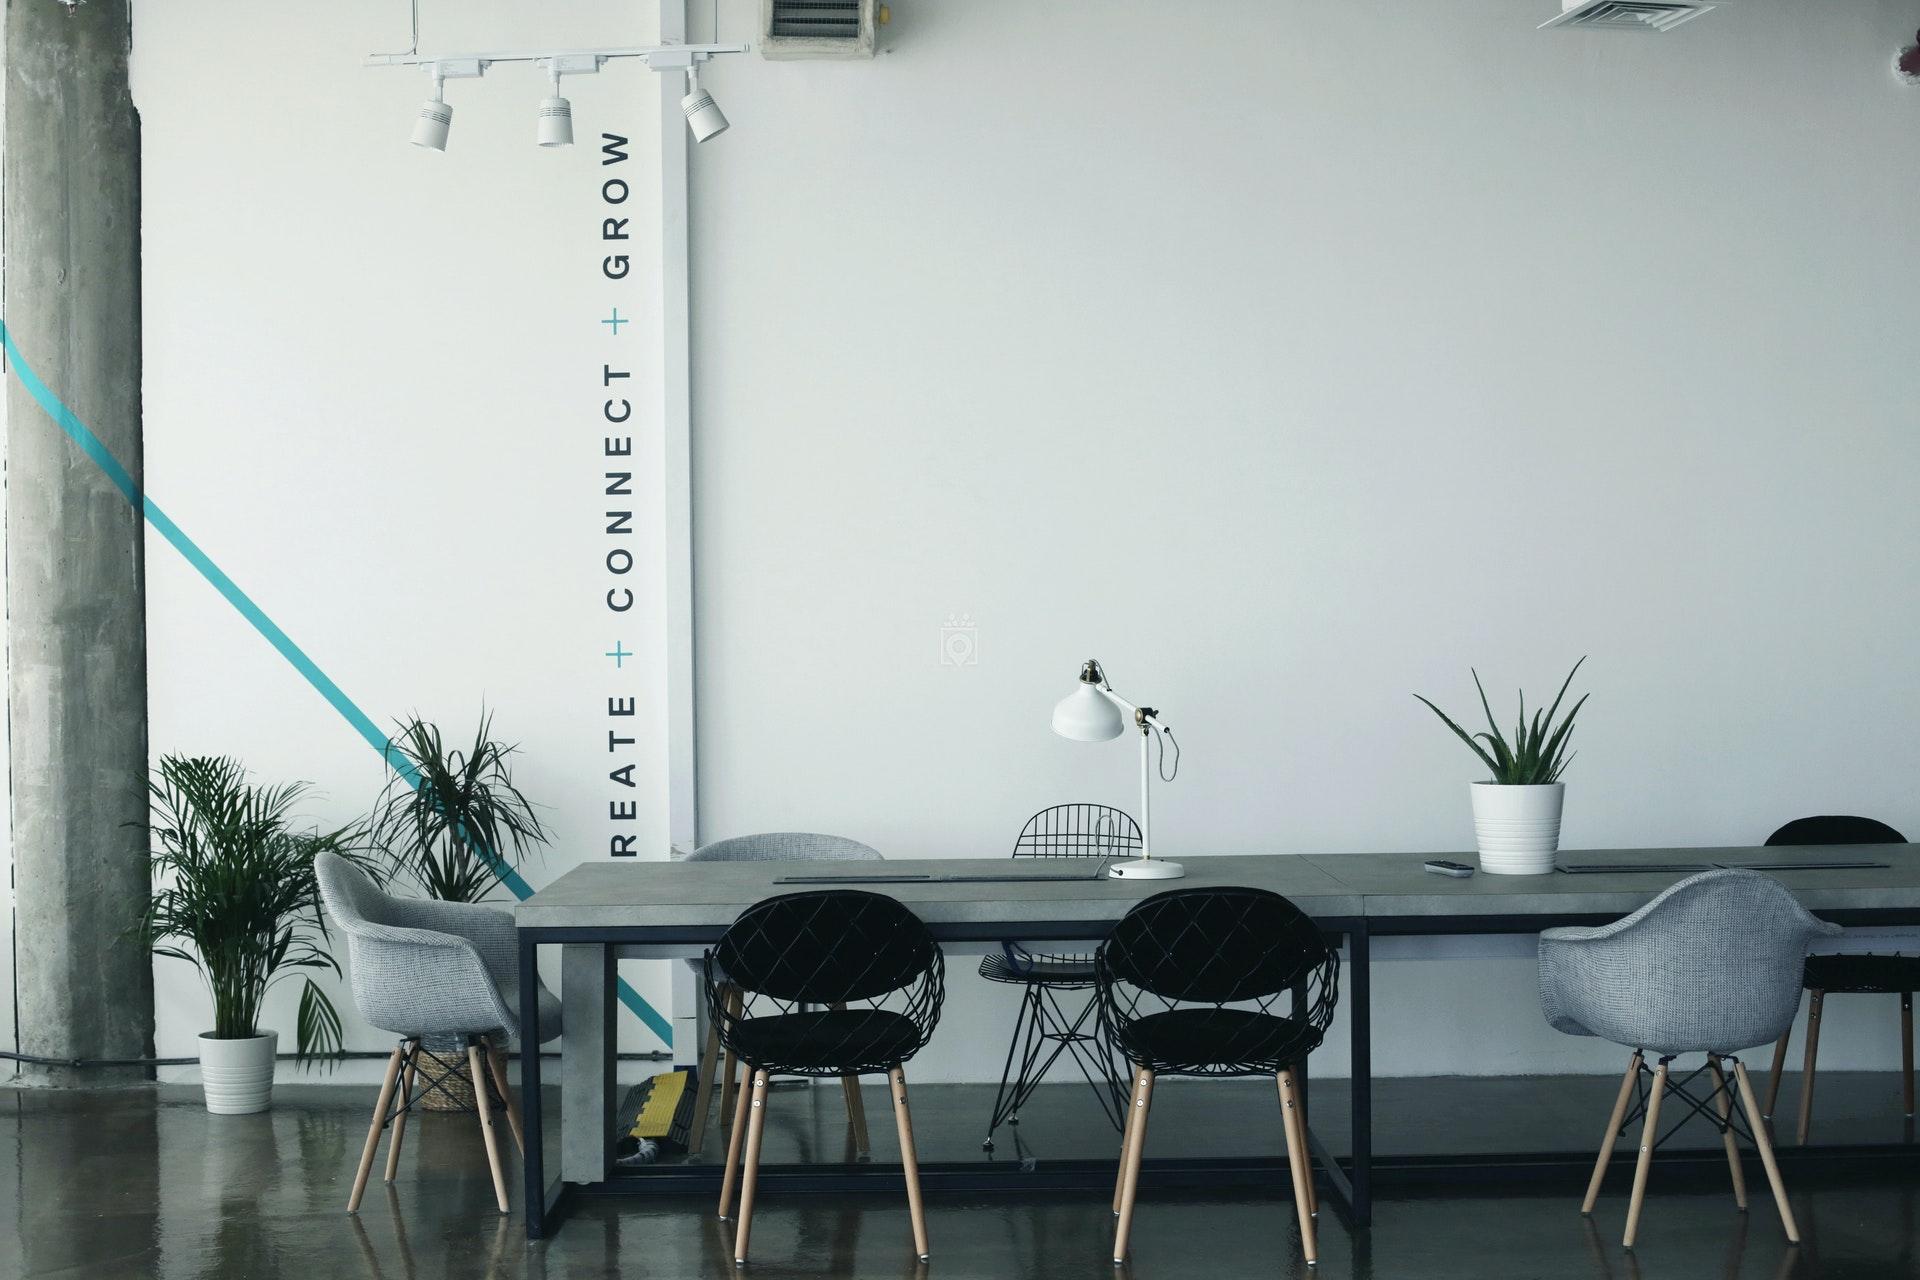 Re:Urban Studio, Dubai - Read Reviews & Book Online